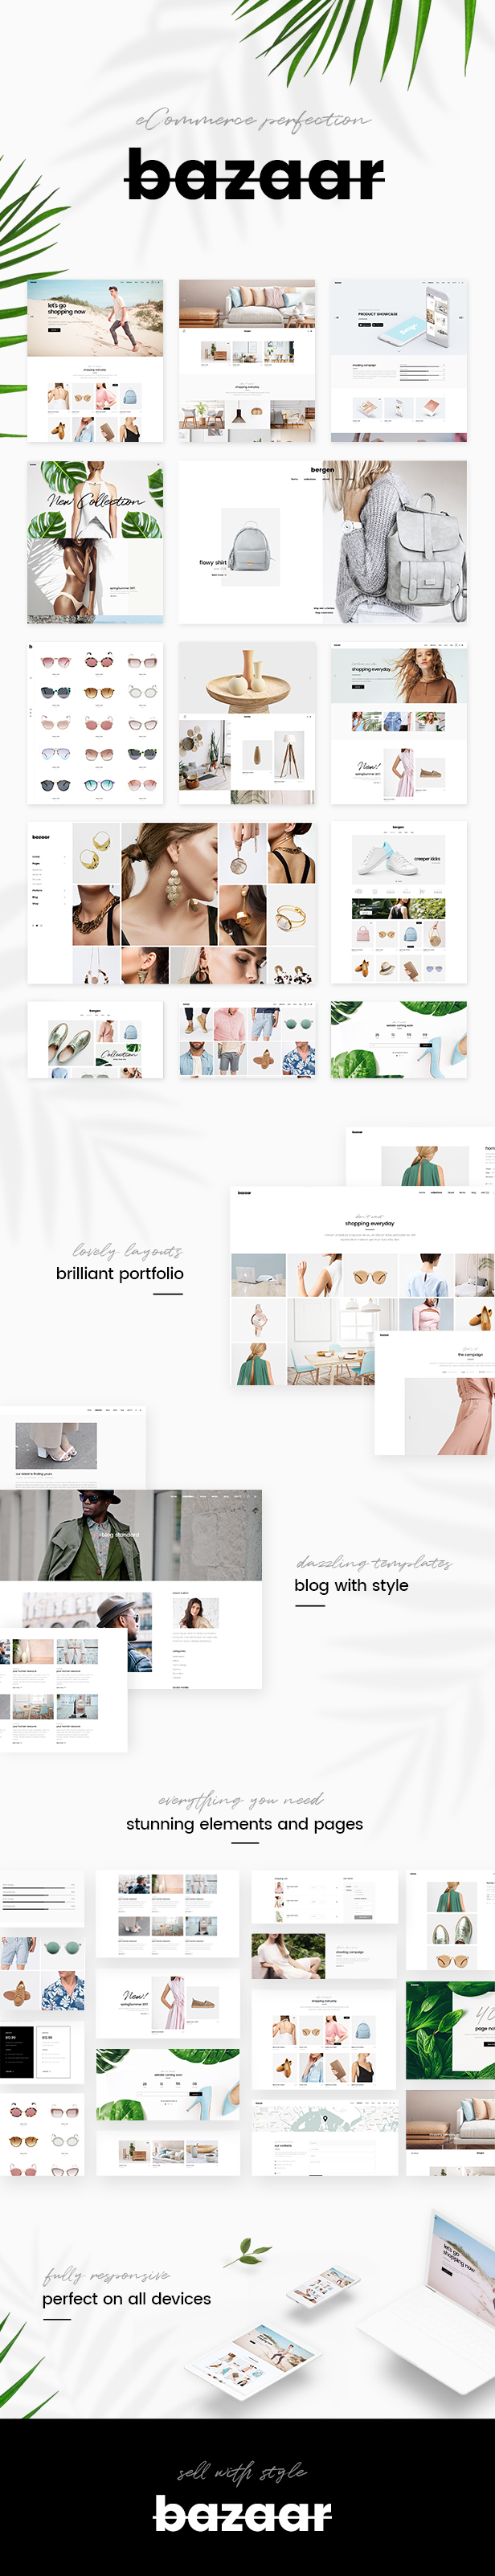 Bazaar - eCommerce Theme - 1